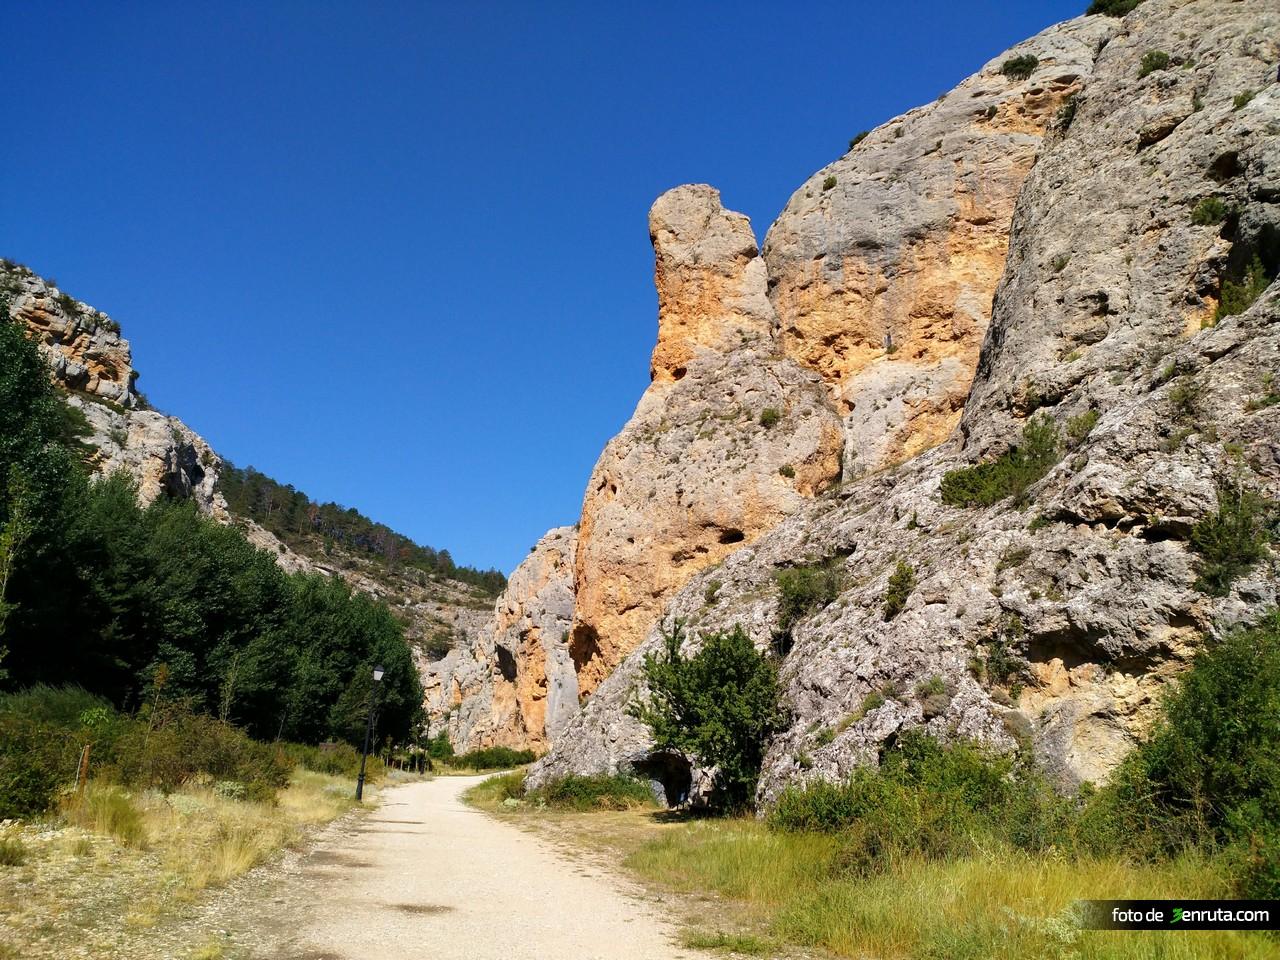 Inicio de la ruta del Barranco de la Hoz